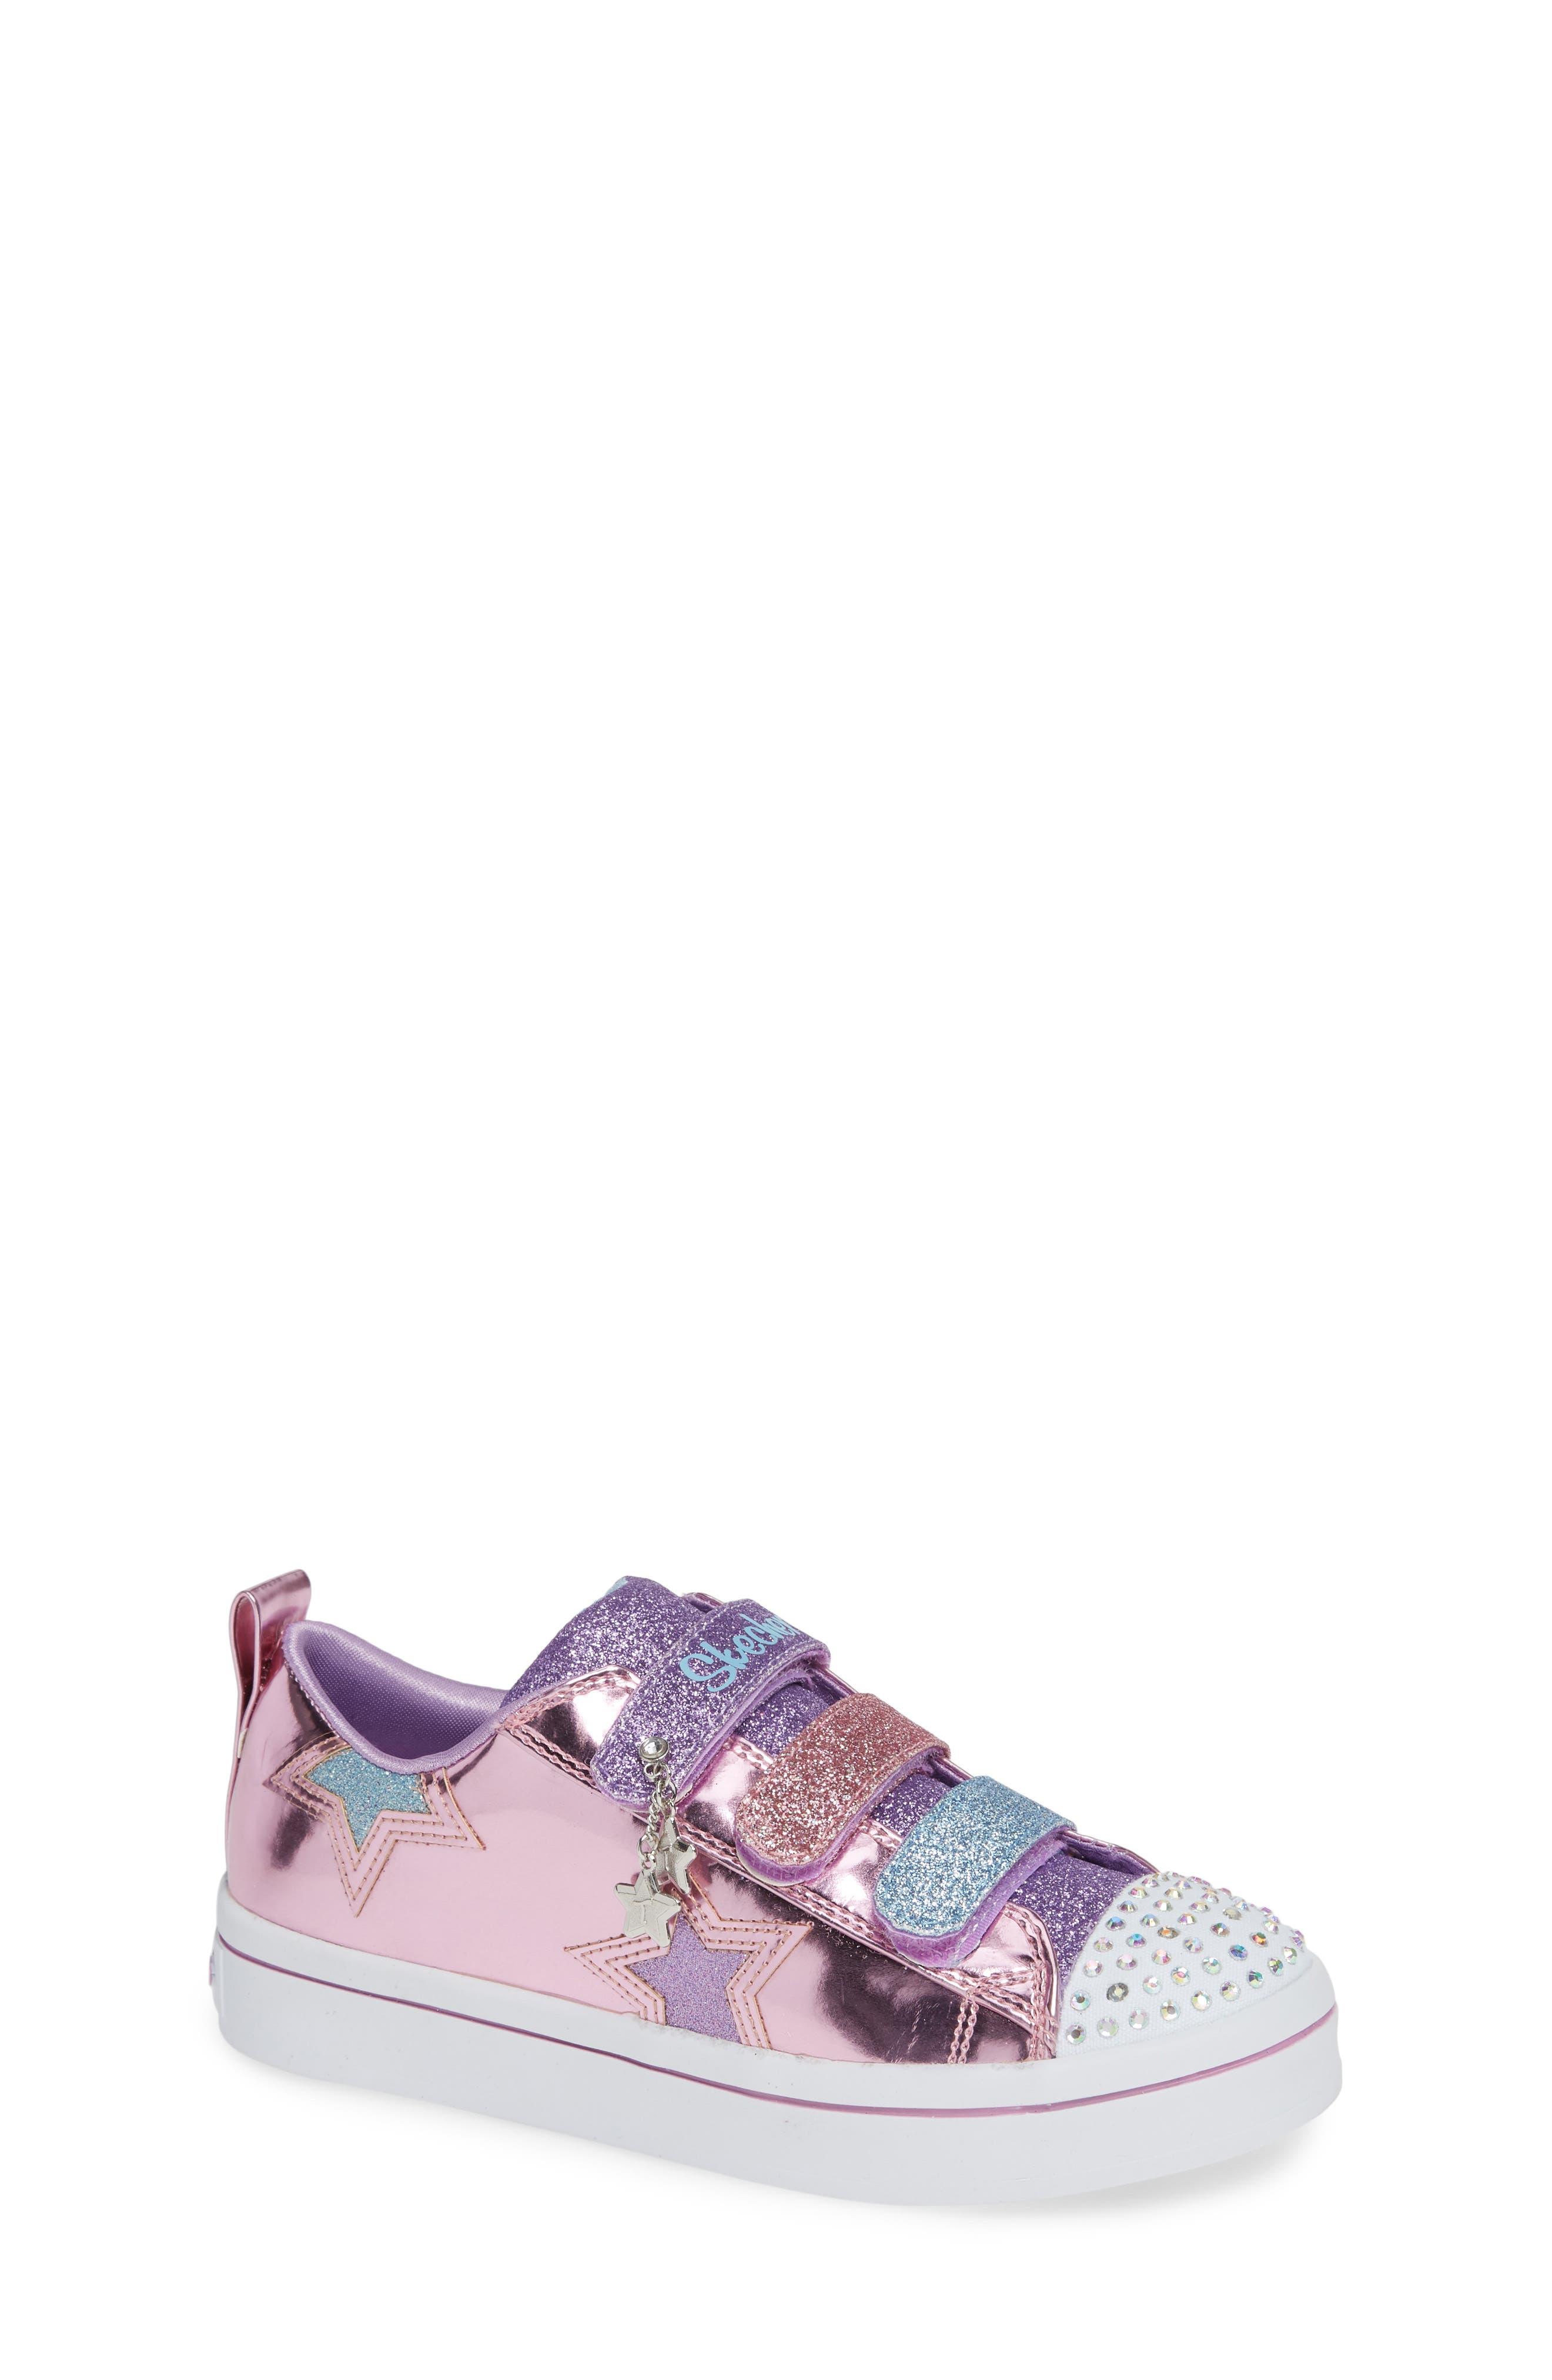 Twi-Lites Star Light-Up Sneaker,                             Main thumbnail 1, color,                             PINK/ MULTI